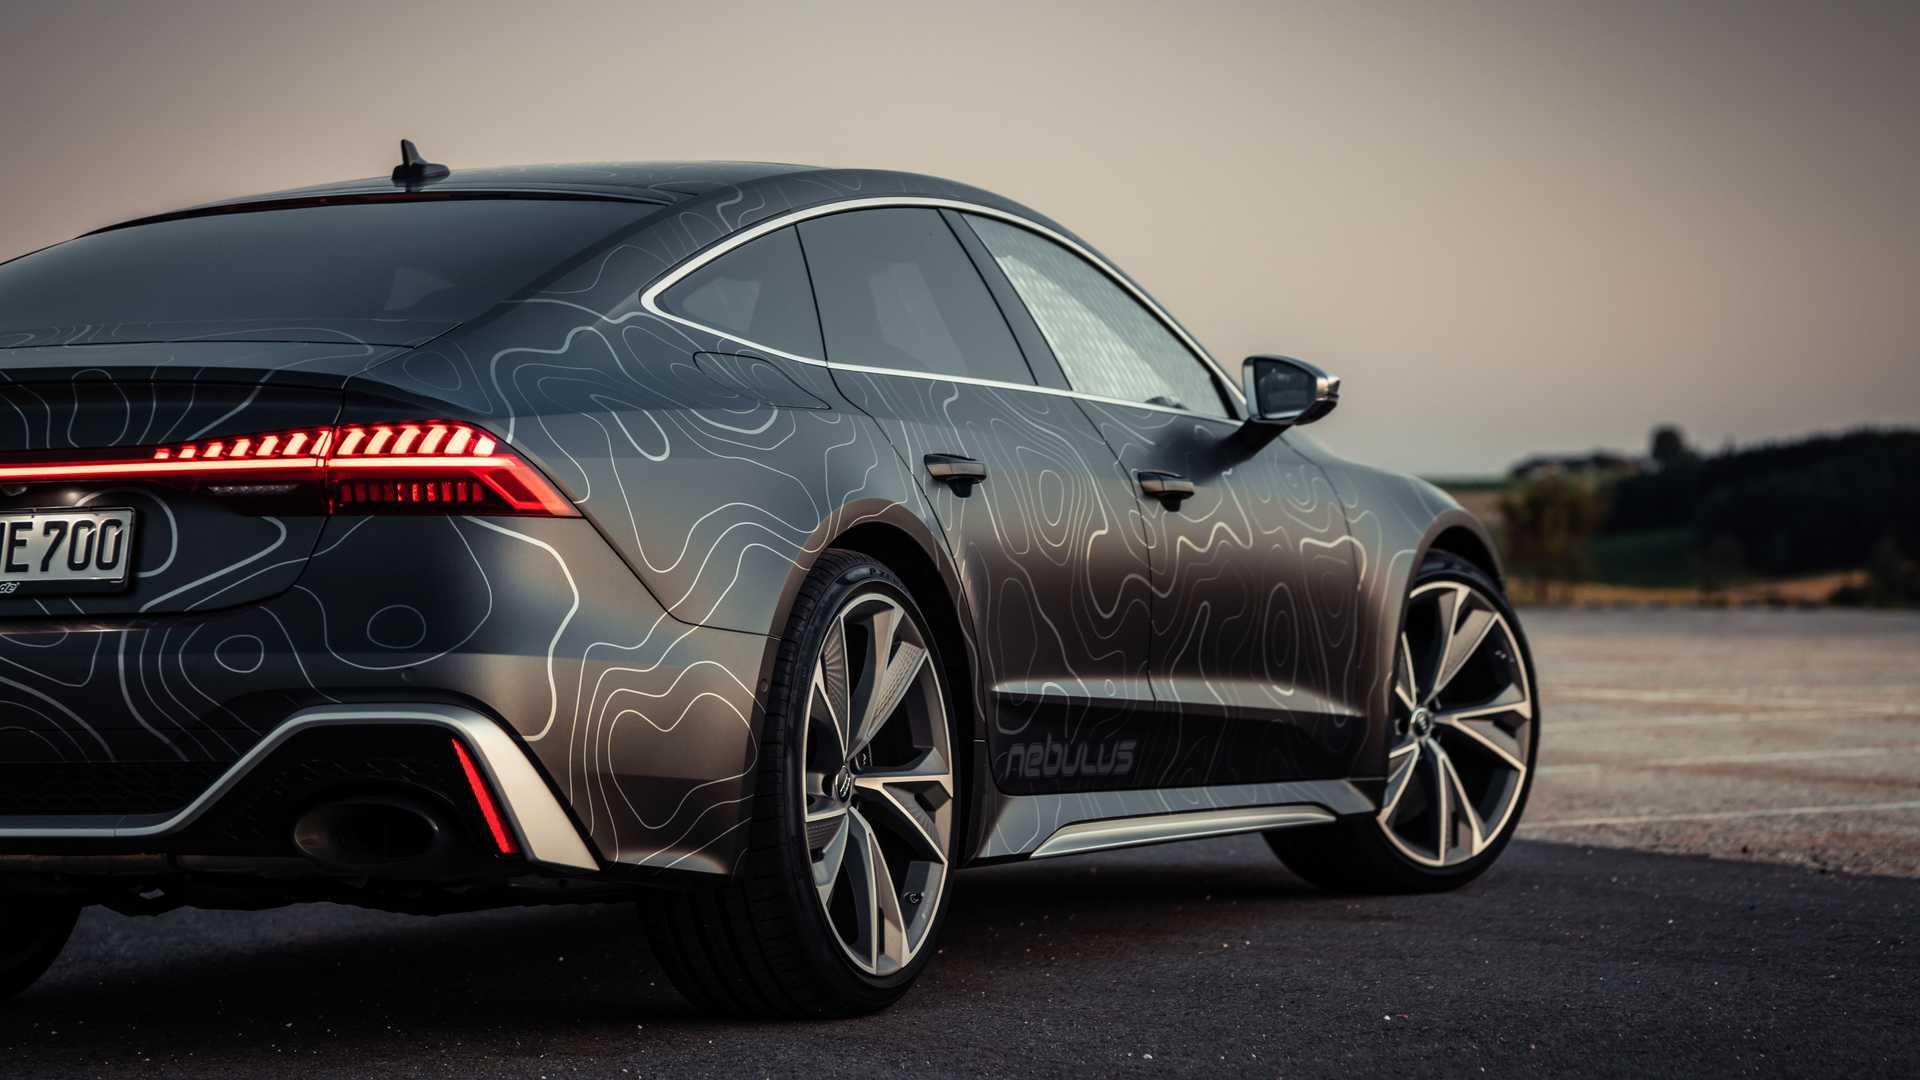 Audi-RS7-By-Black-Box-Richter-10